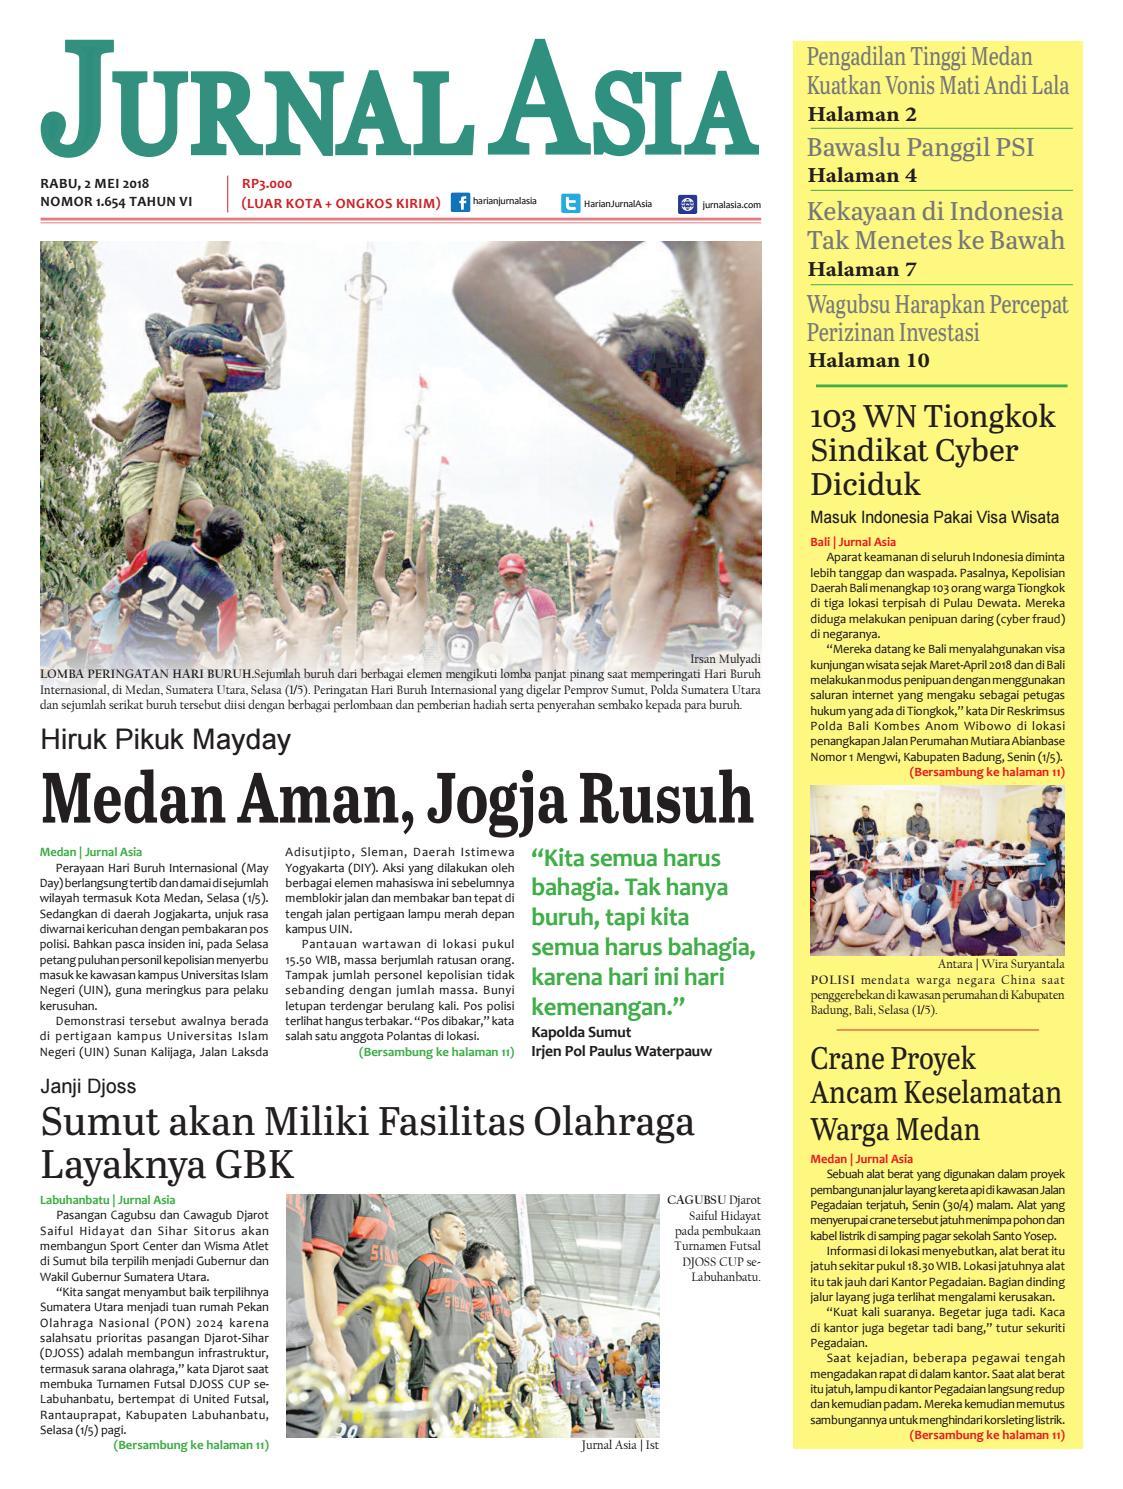 Harian Jurnal Asia Edisi Rabu 02 Mei 2018 By Harian Jurnal Asia